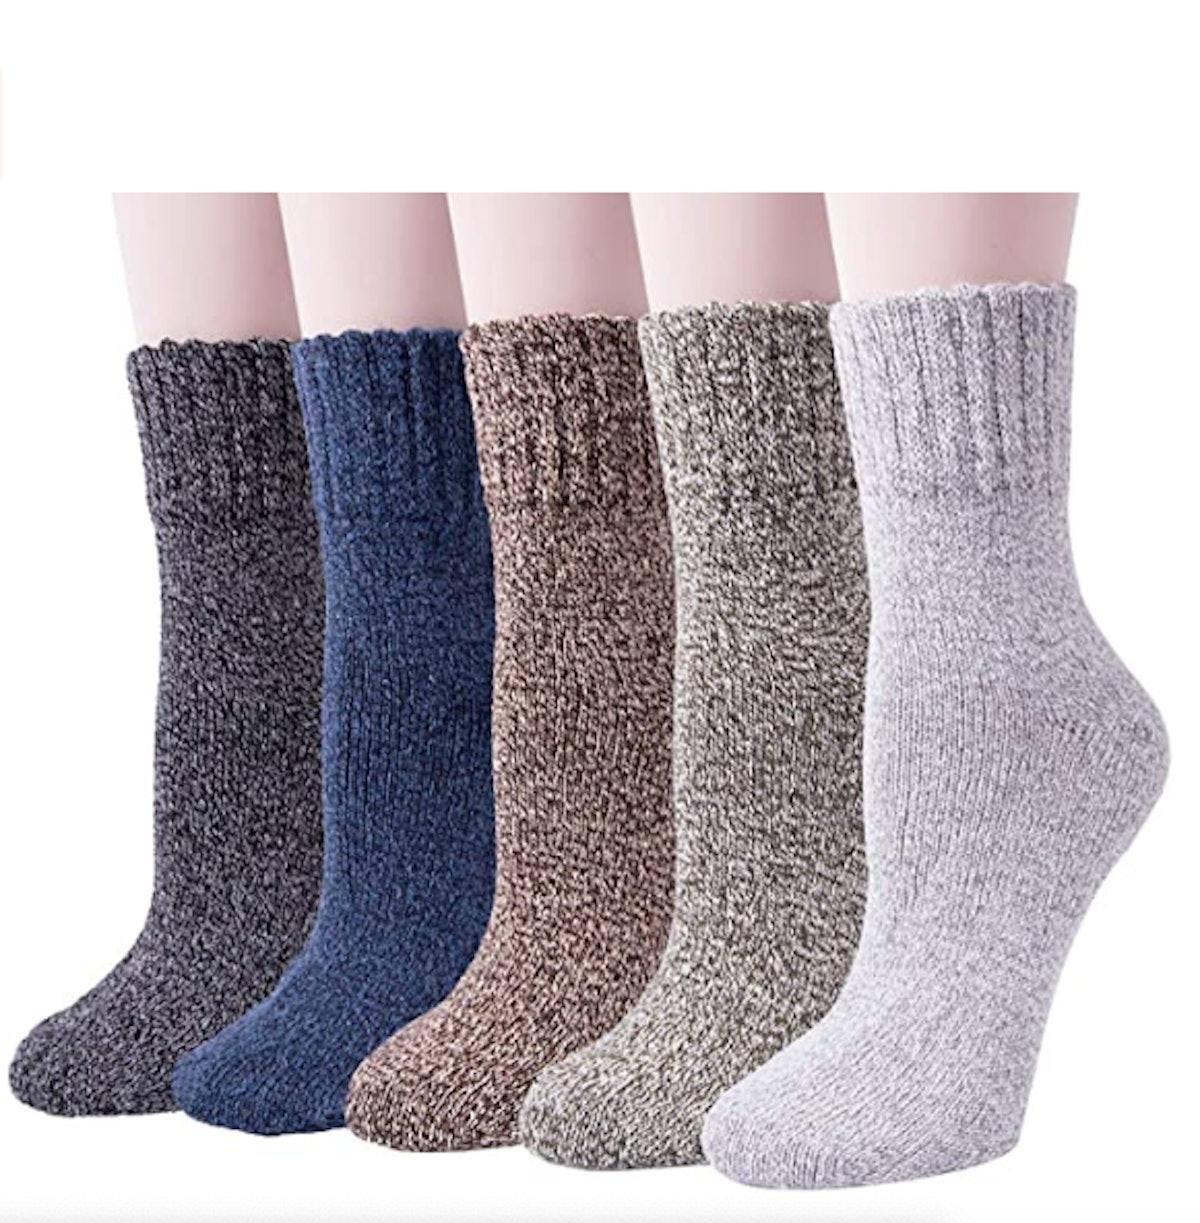 Senker Warm Wool Thick Knit Winter Socks (5-Pack)